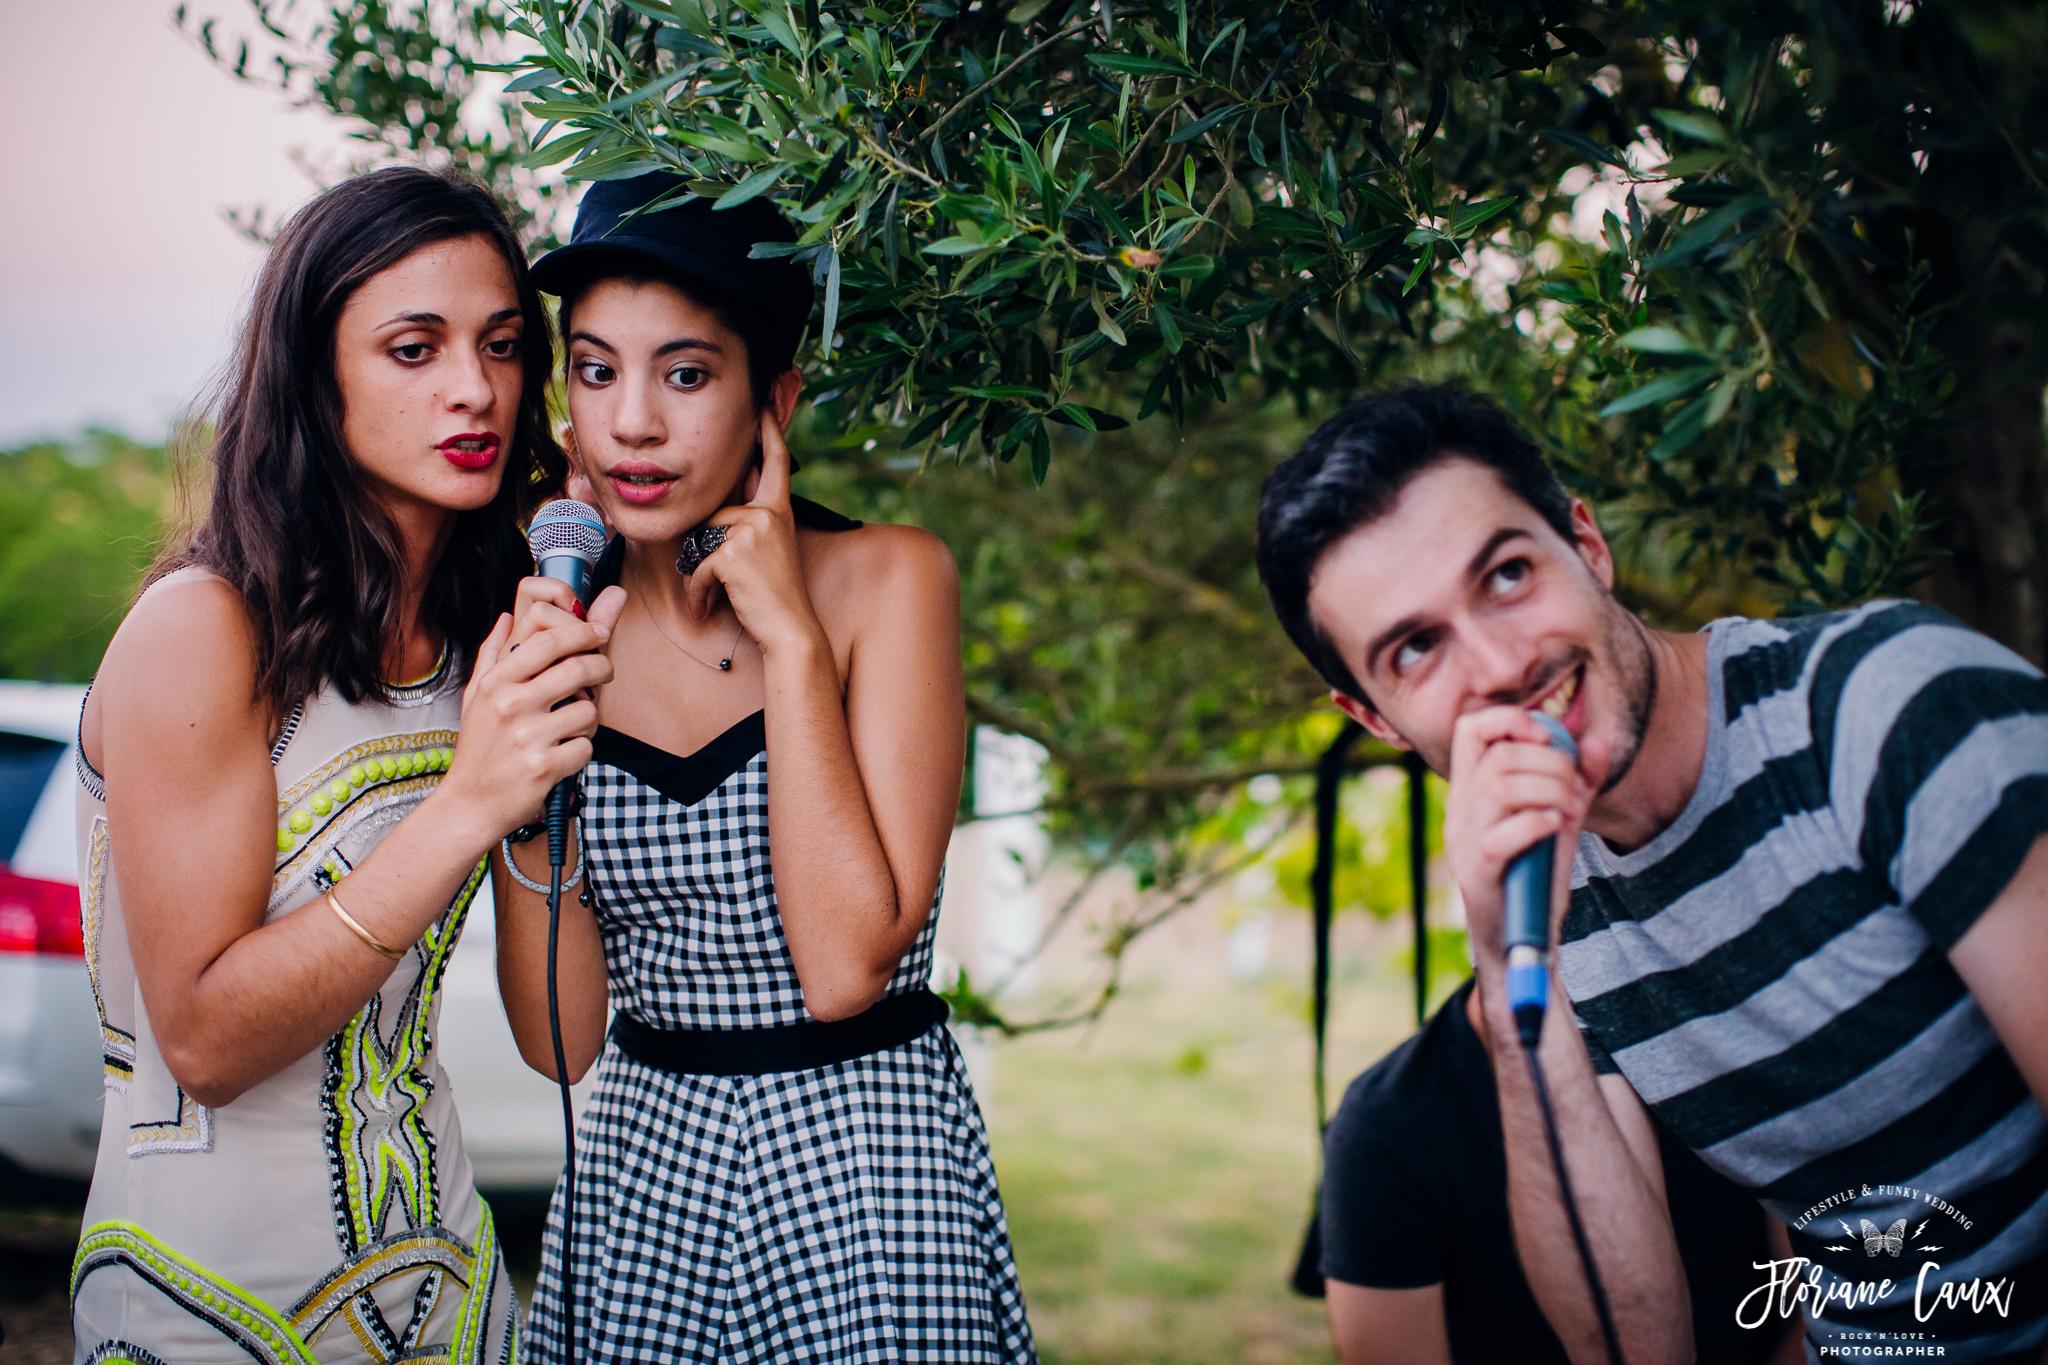 photographe-mariage-toulouse-rocknroll-maries-tatoues-floriane-caux-100